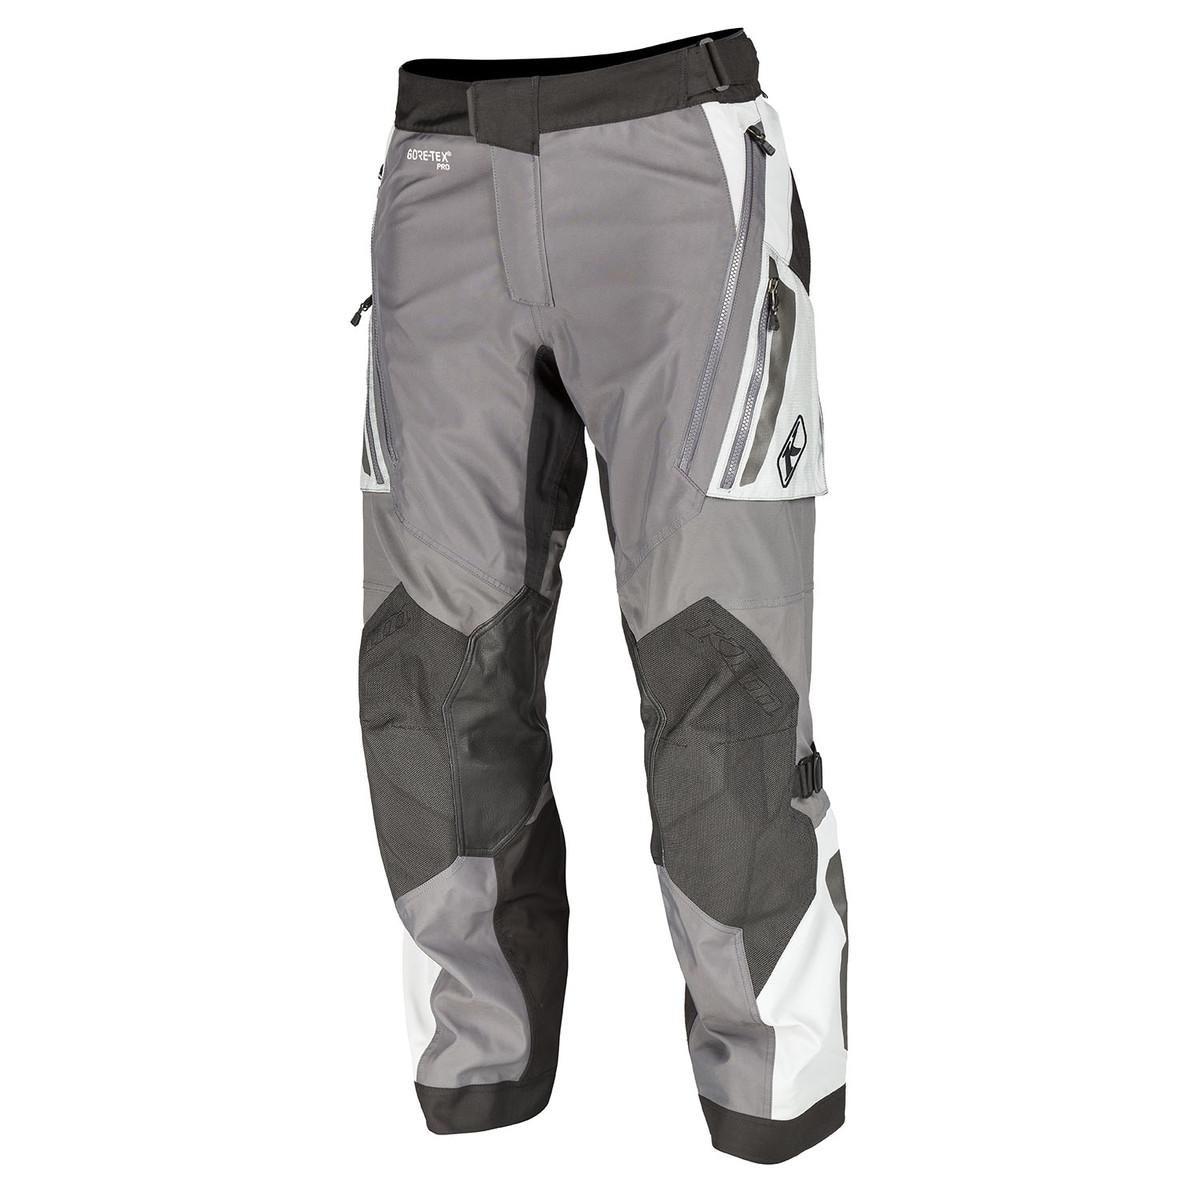 Badlands Pro Pant Gray